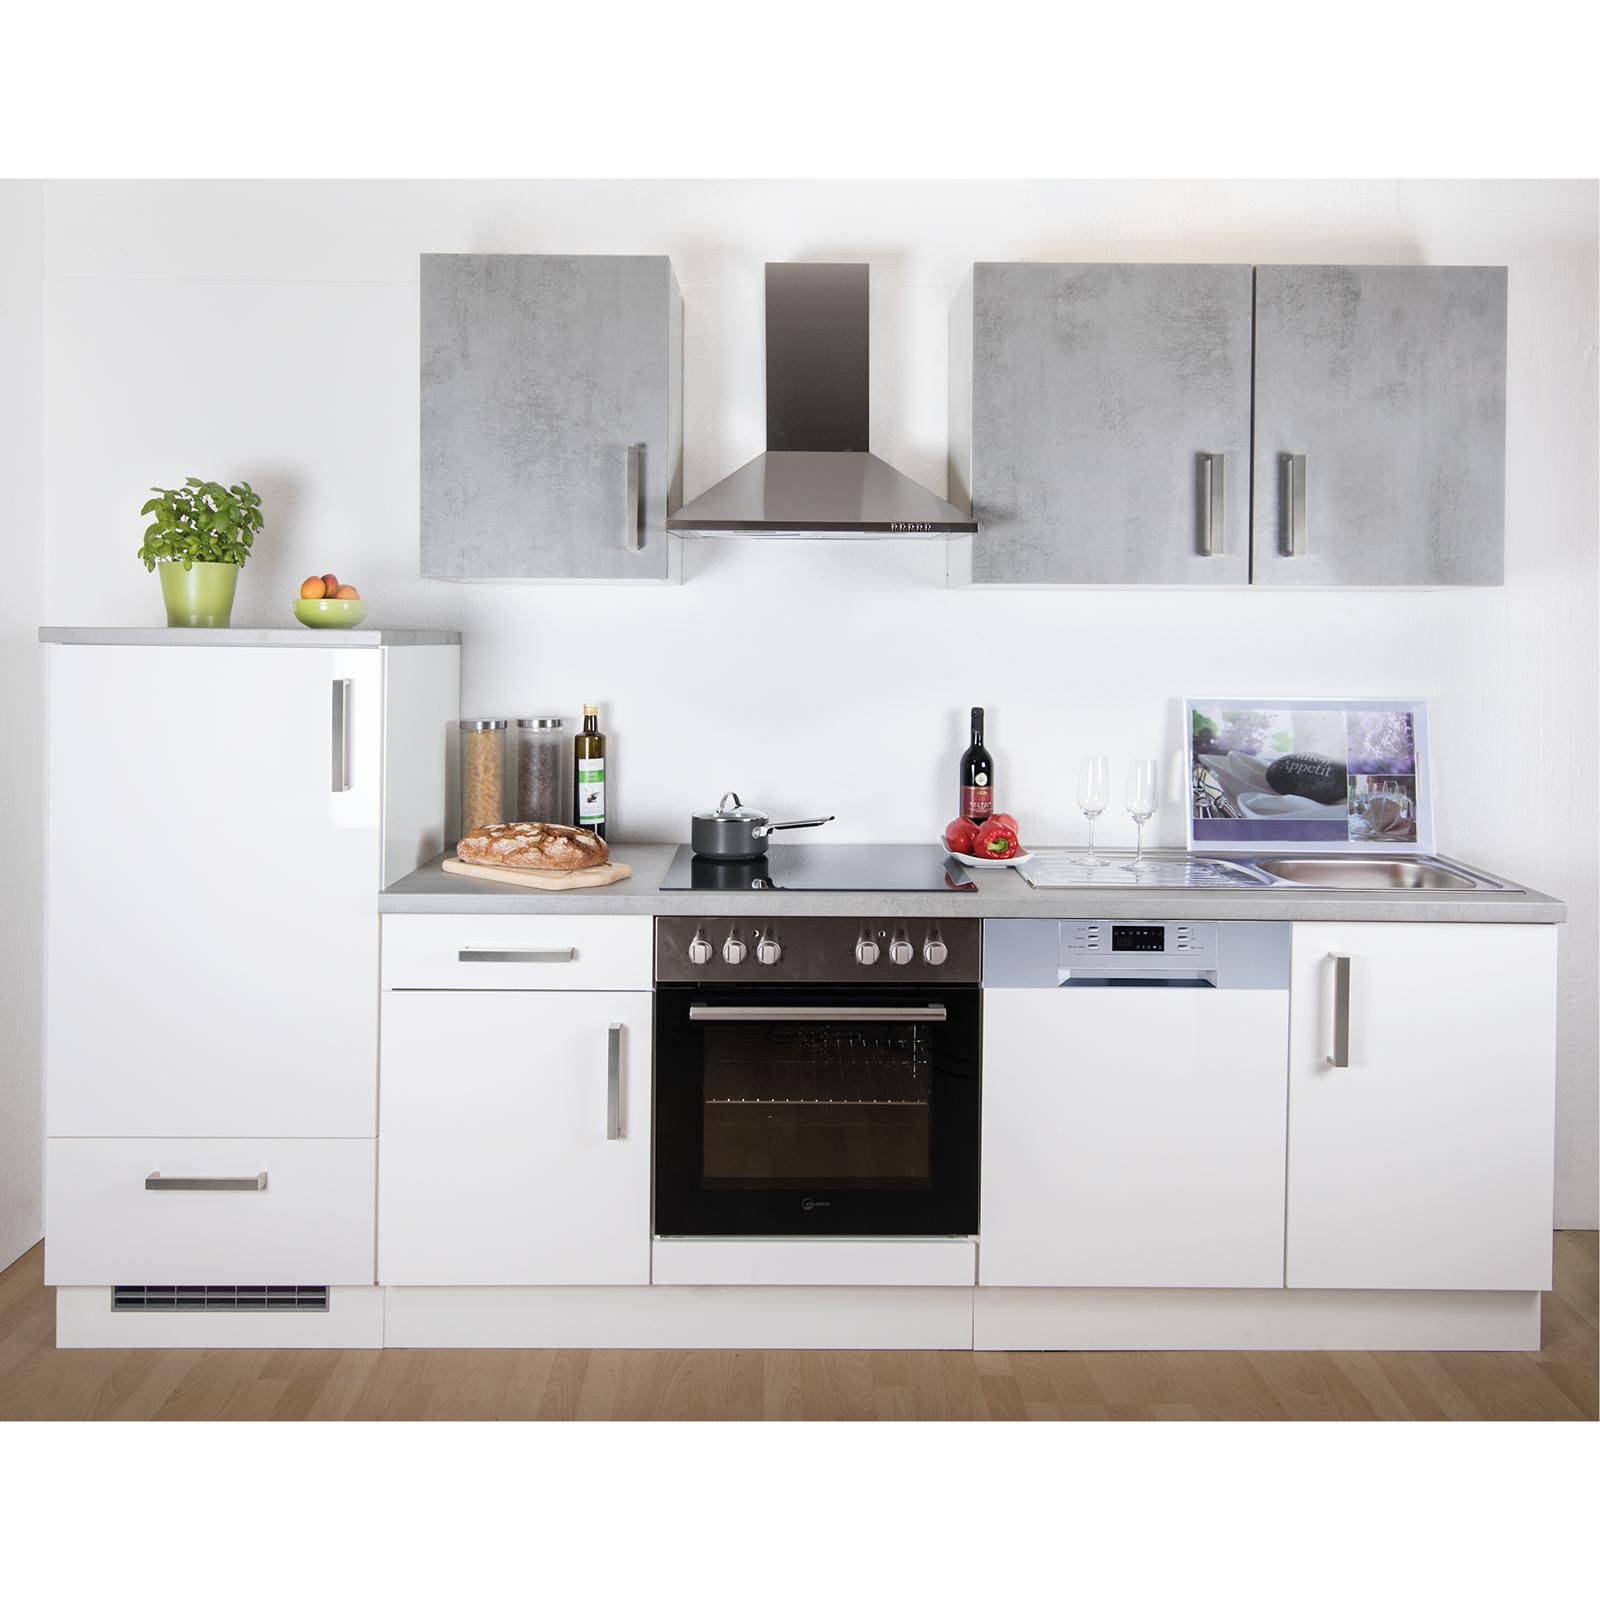 Kuchenblock Weiss Hochglanz Betonoptik 280 Cm Online Bei Roller Kaufen